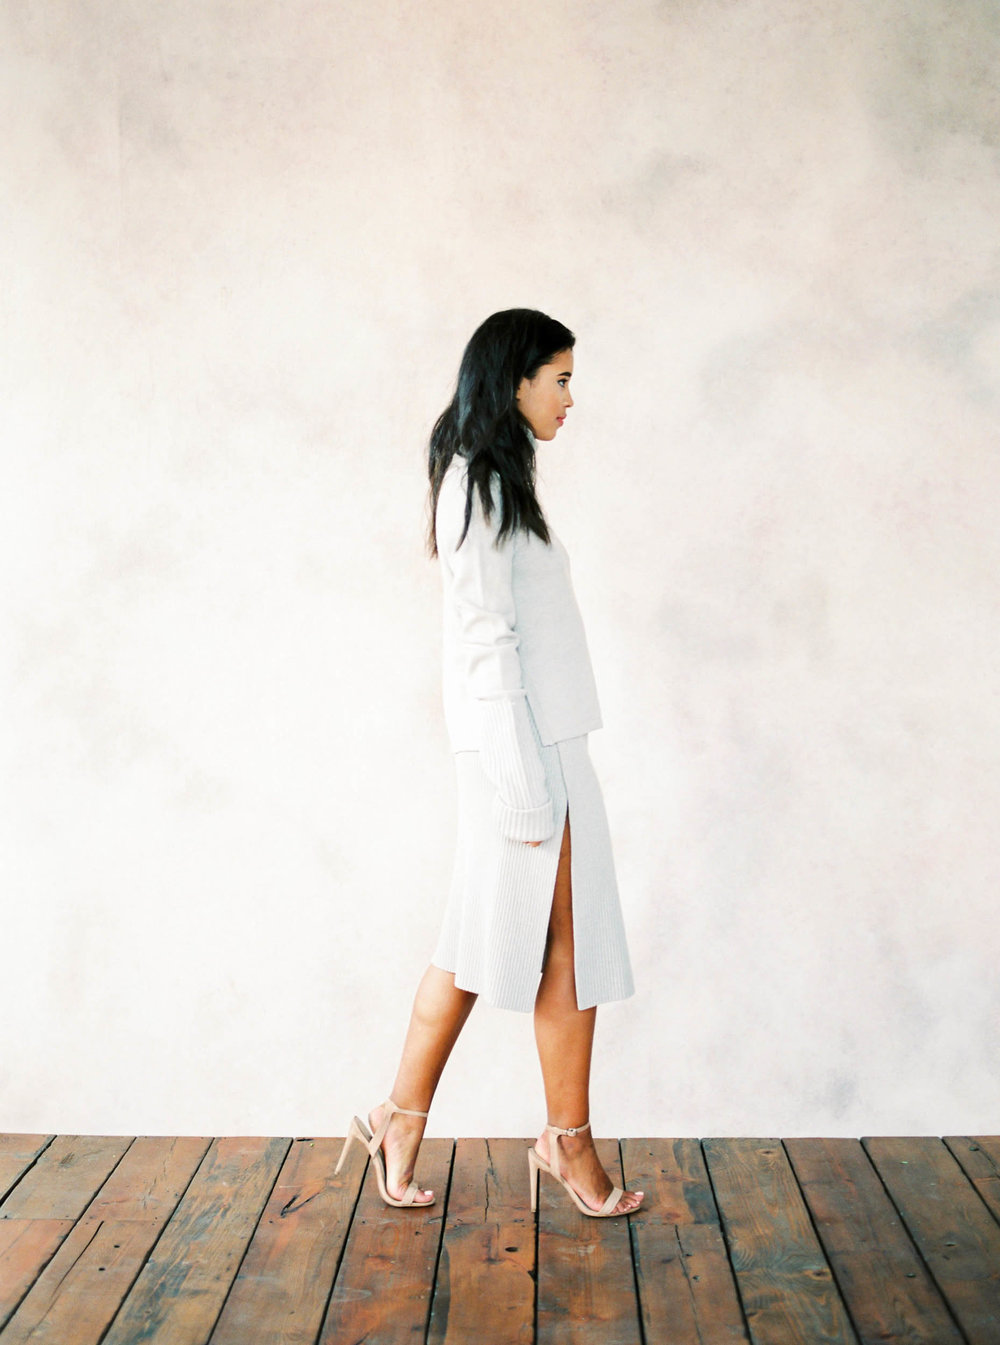 Amy O'Boyle Photography- Destination & UK Fine Art Film Wedding Photographer- London Editorial Fashion Shoot on Film-43.jpg